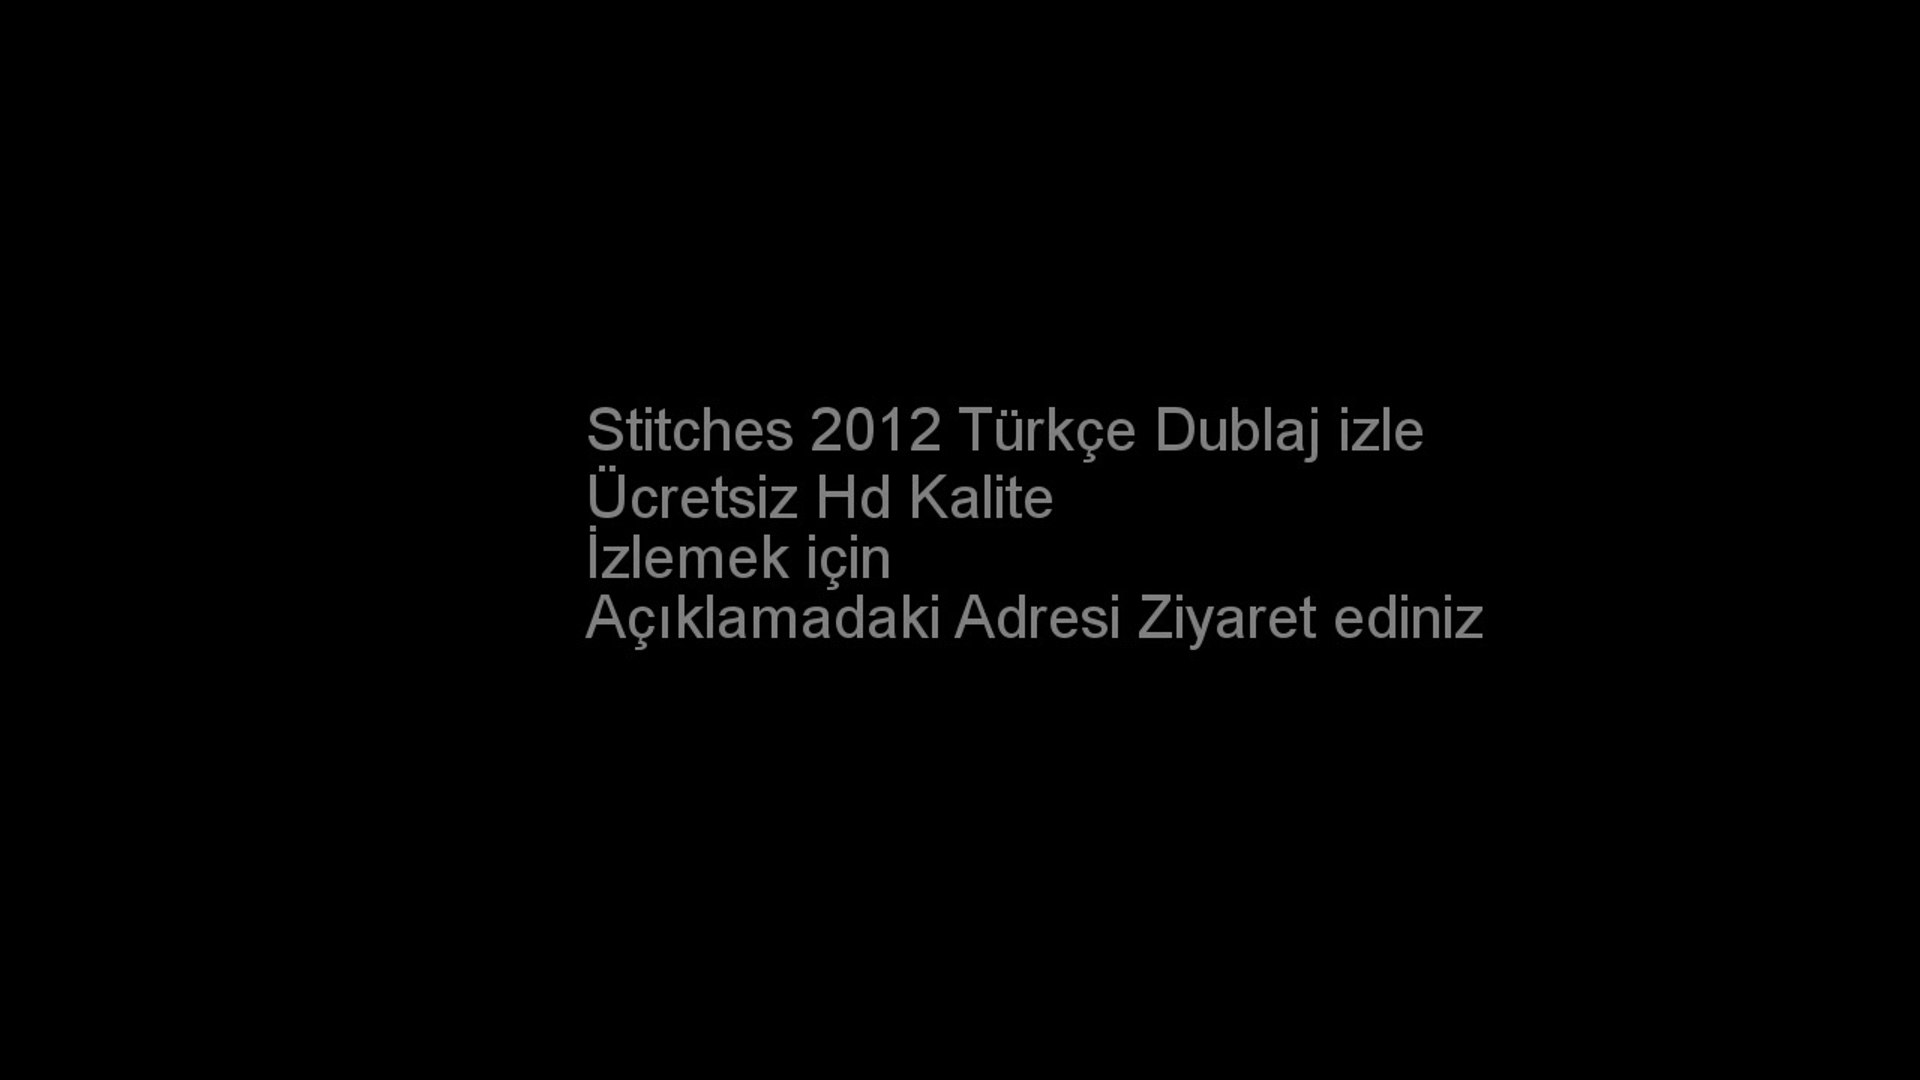 Stitches 2012 Türkçe Dublaj izle